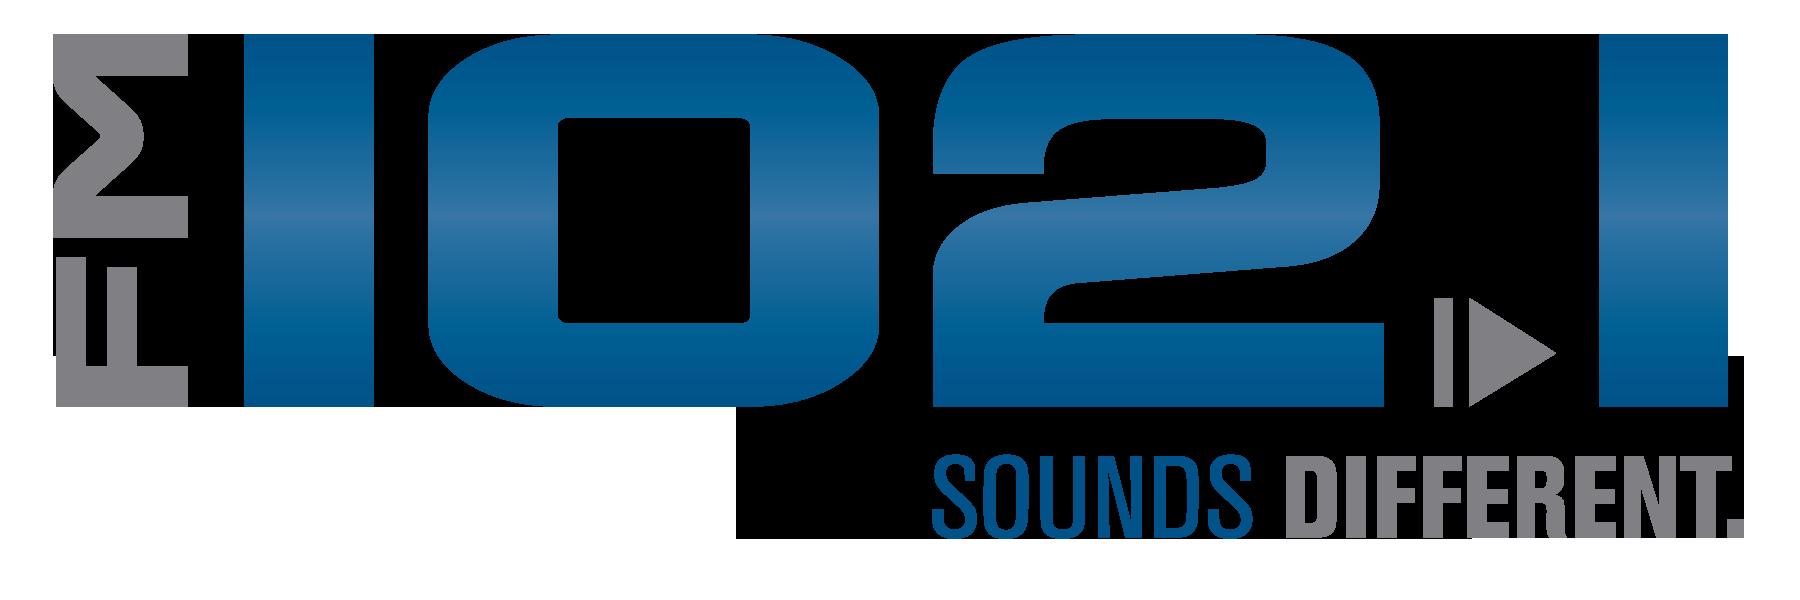 FM 102/1